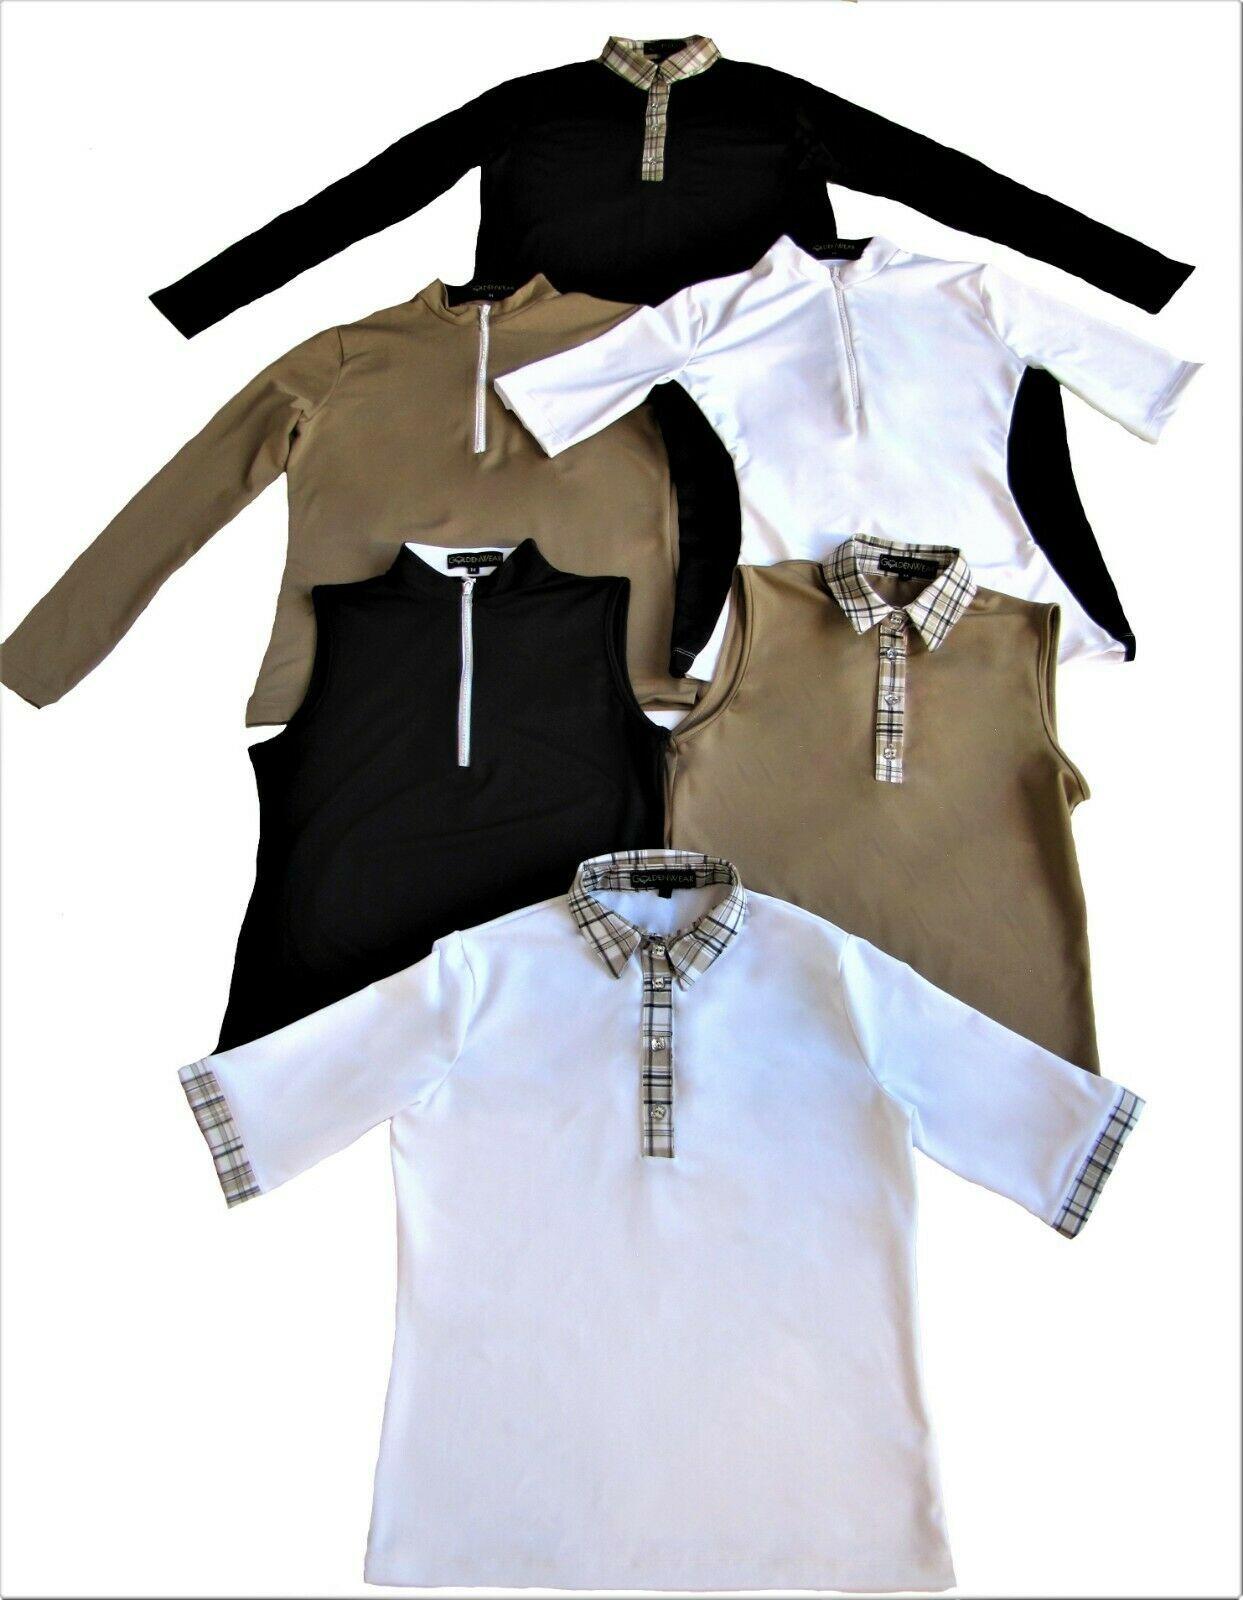 Stylish Women's Golf & Resort Black Long Sleeve Collar Top, Swarovski Buttons  image 2